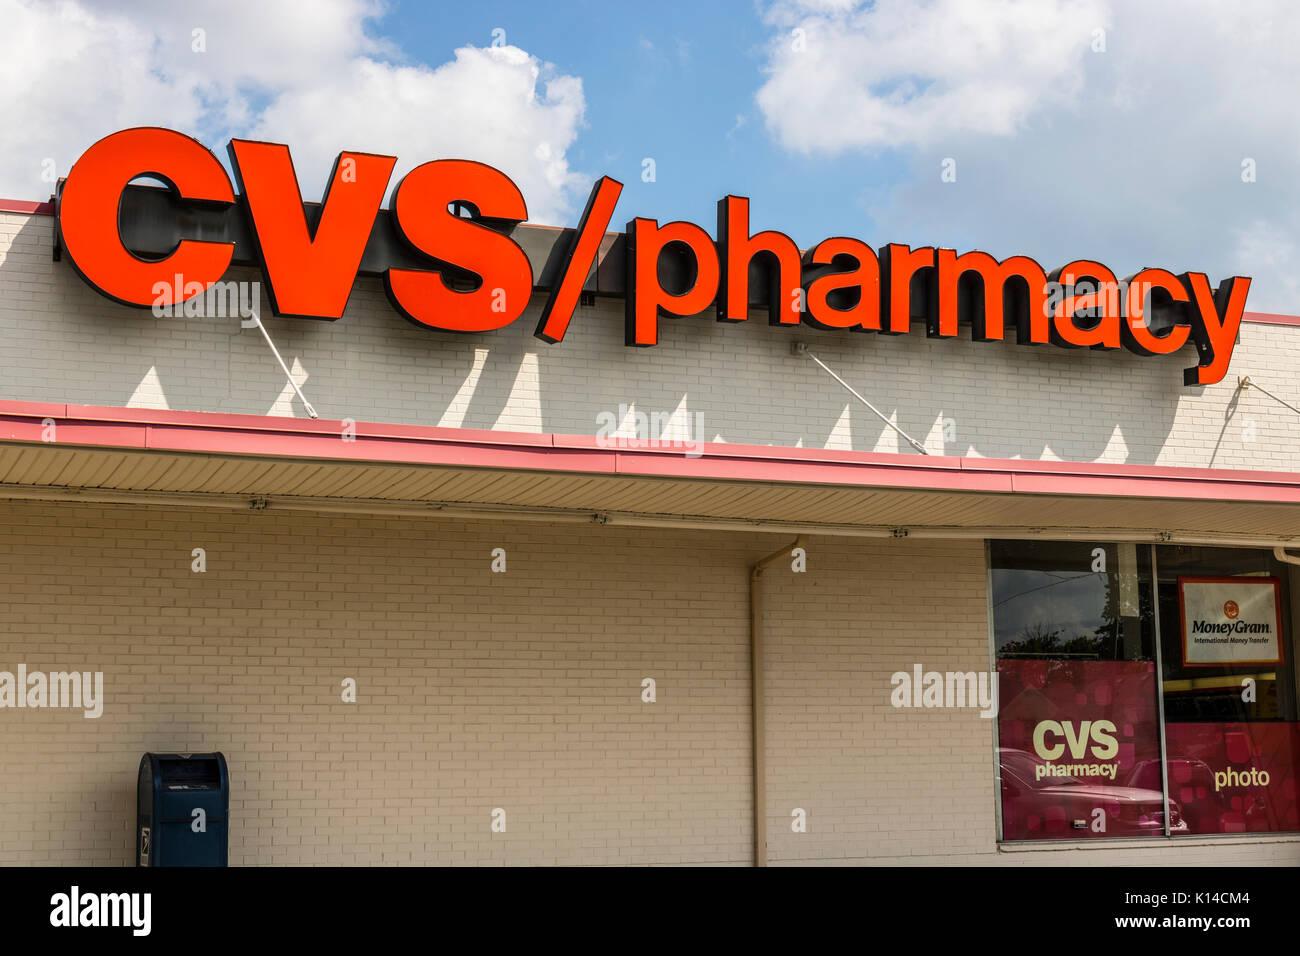 Cvs Beauty Stock Photos & Cvs Beauty Stock Images - Alamy